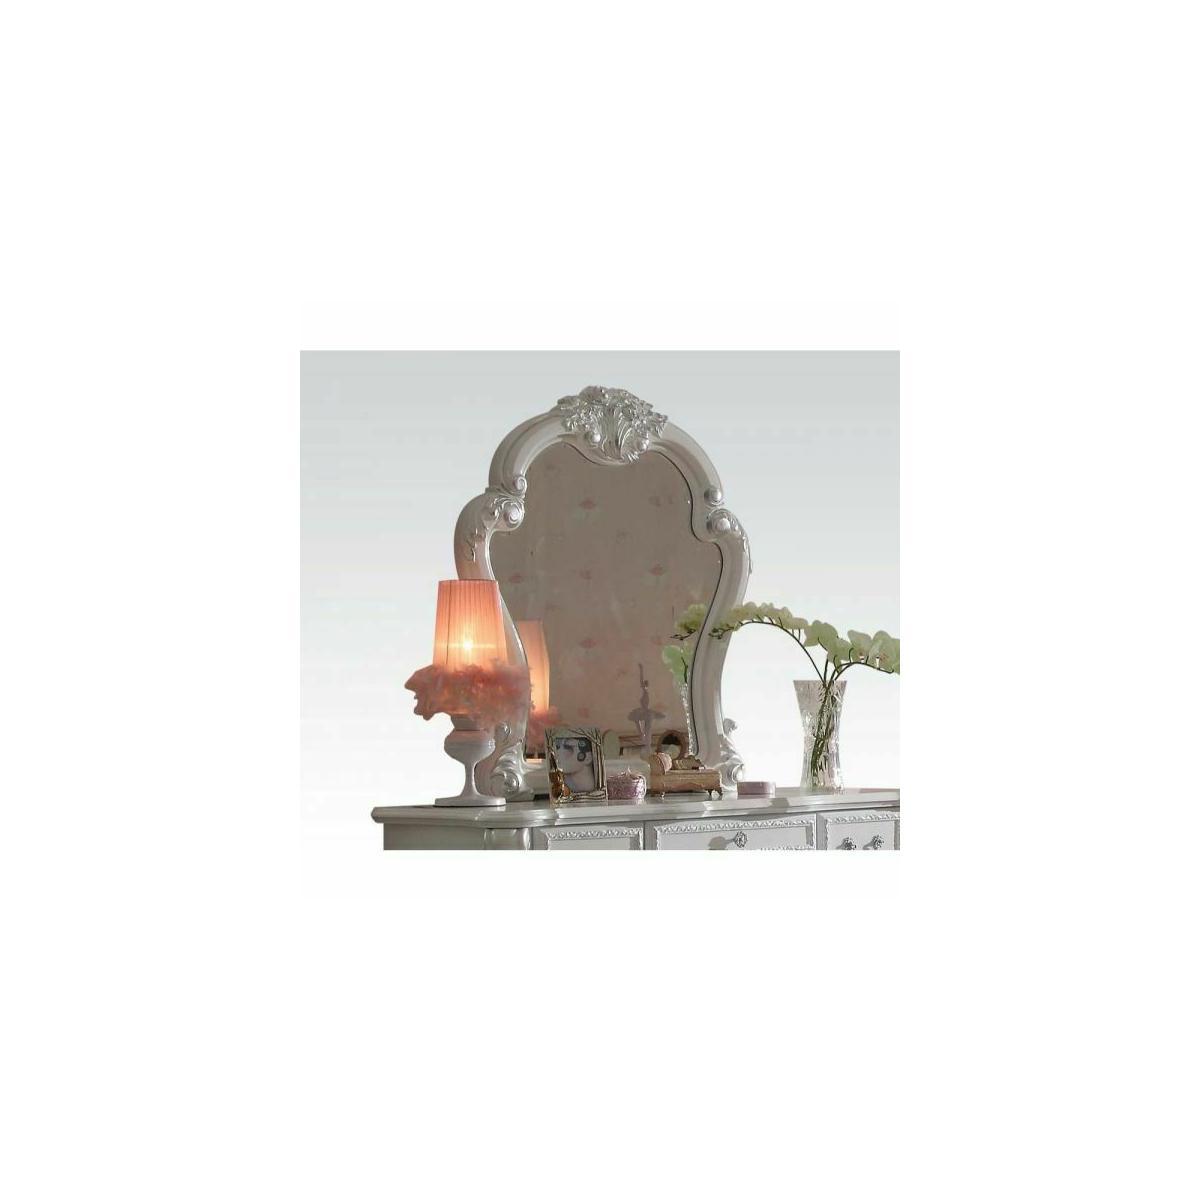 ACME Dresden Mirror - 30669 - Antique White